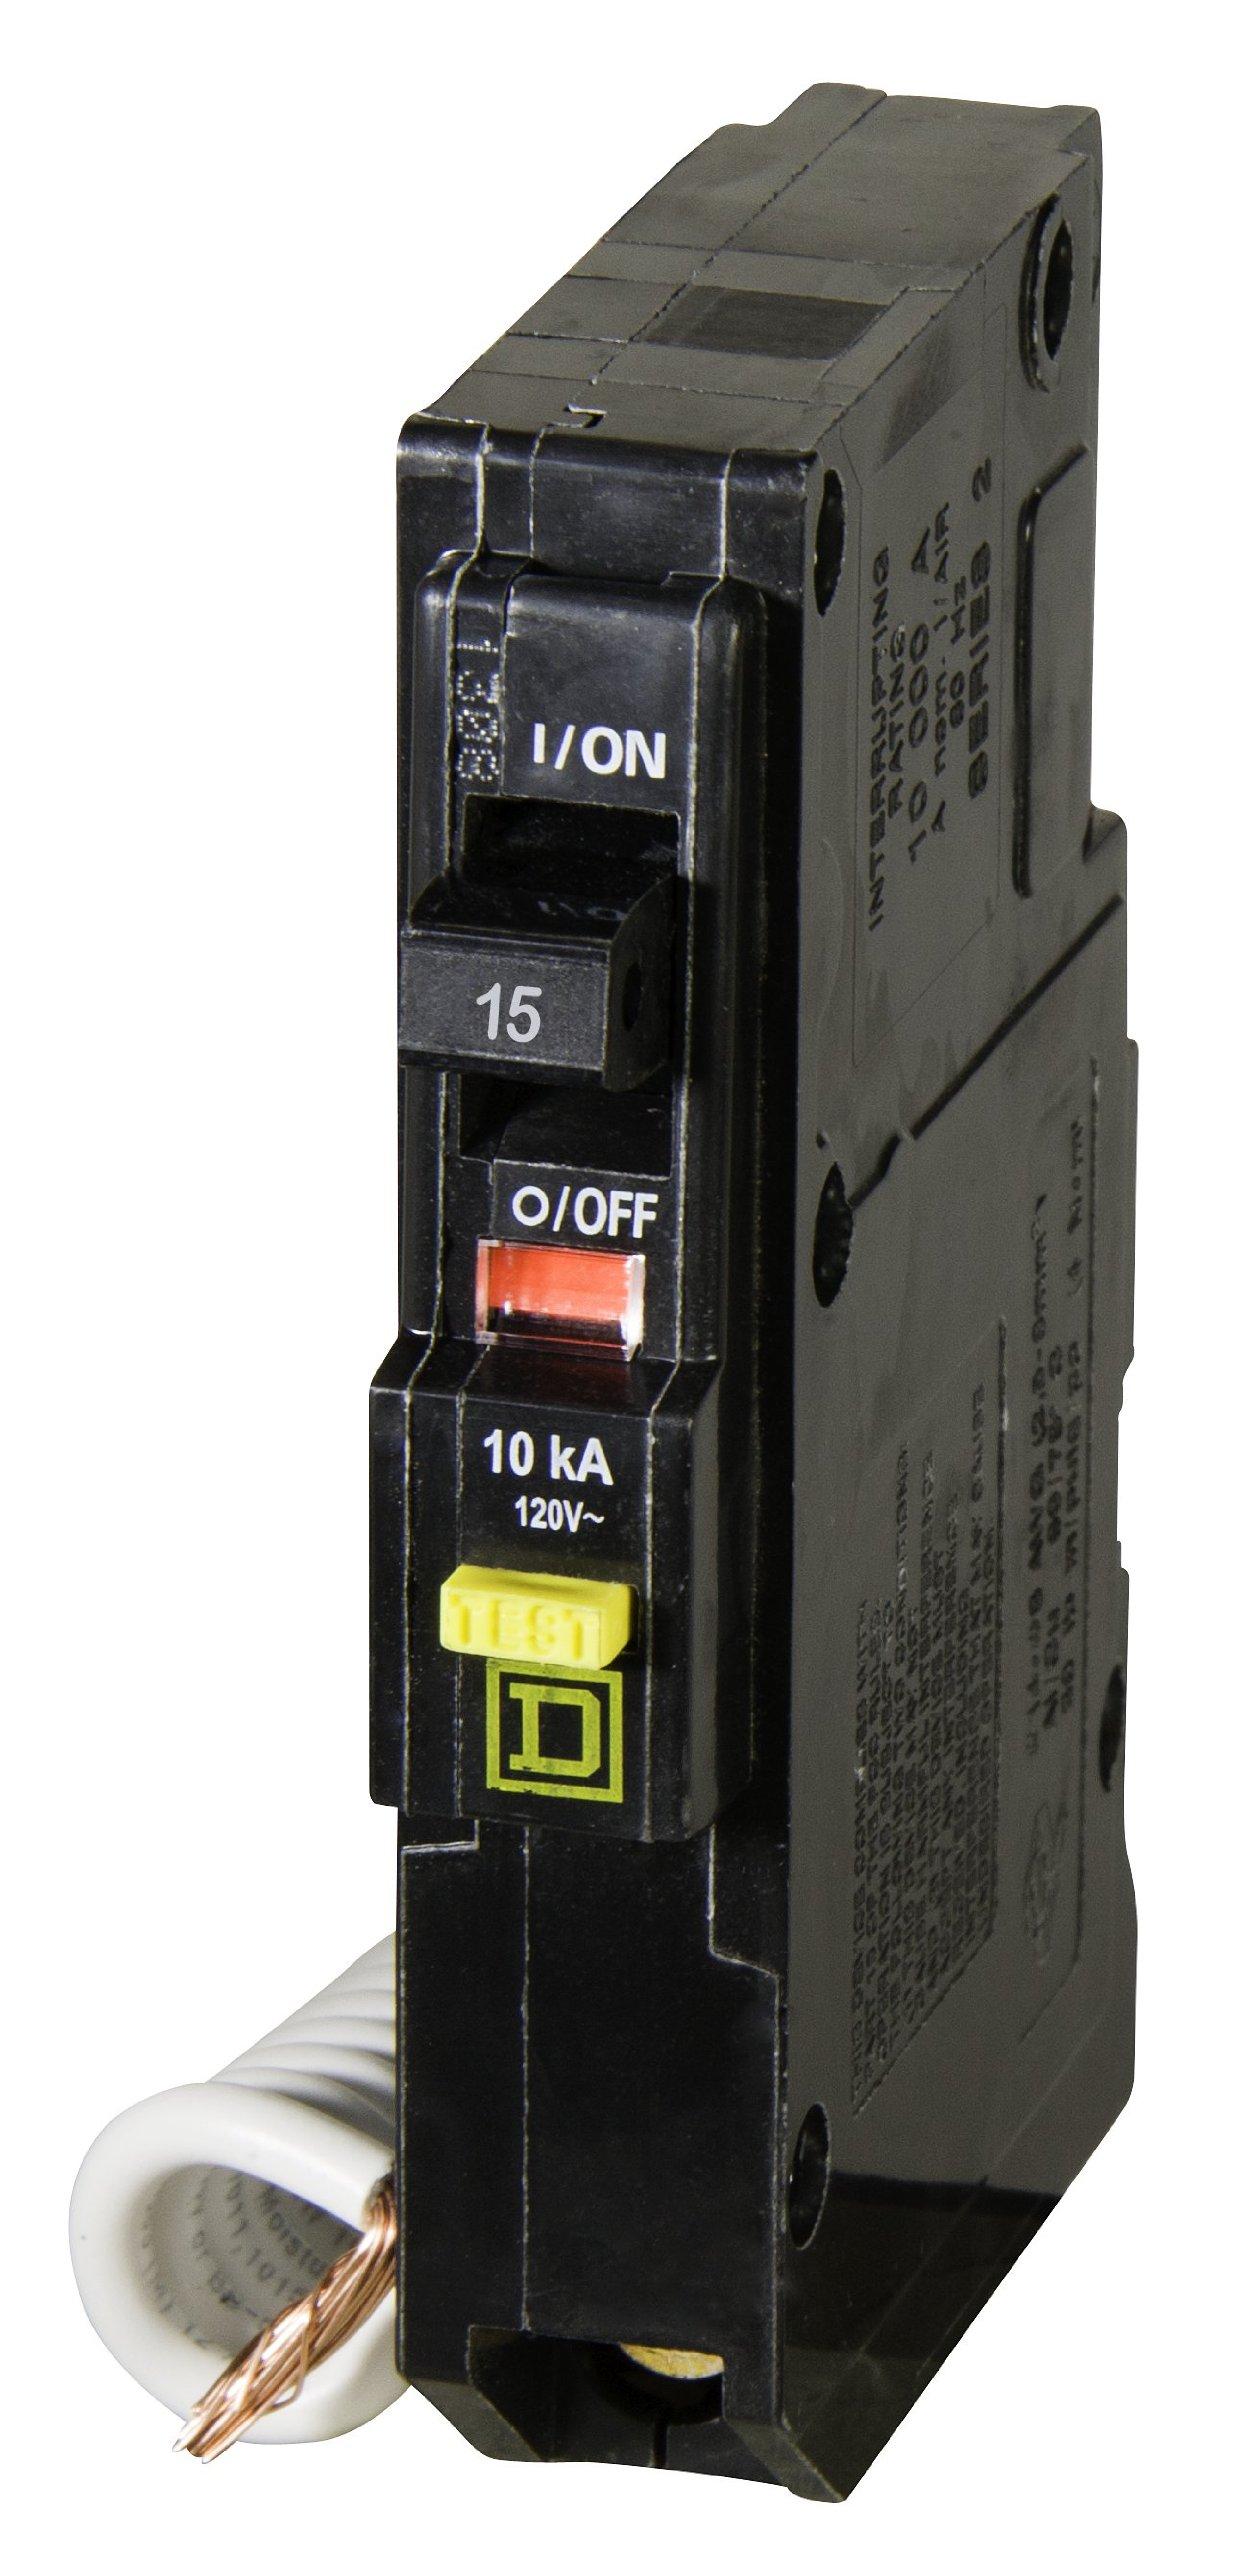 Square D by Schneider Electric QO115GFICP QO Qwik-Gard 15 Amp Single-Pole GFCI Circuit Breaker